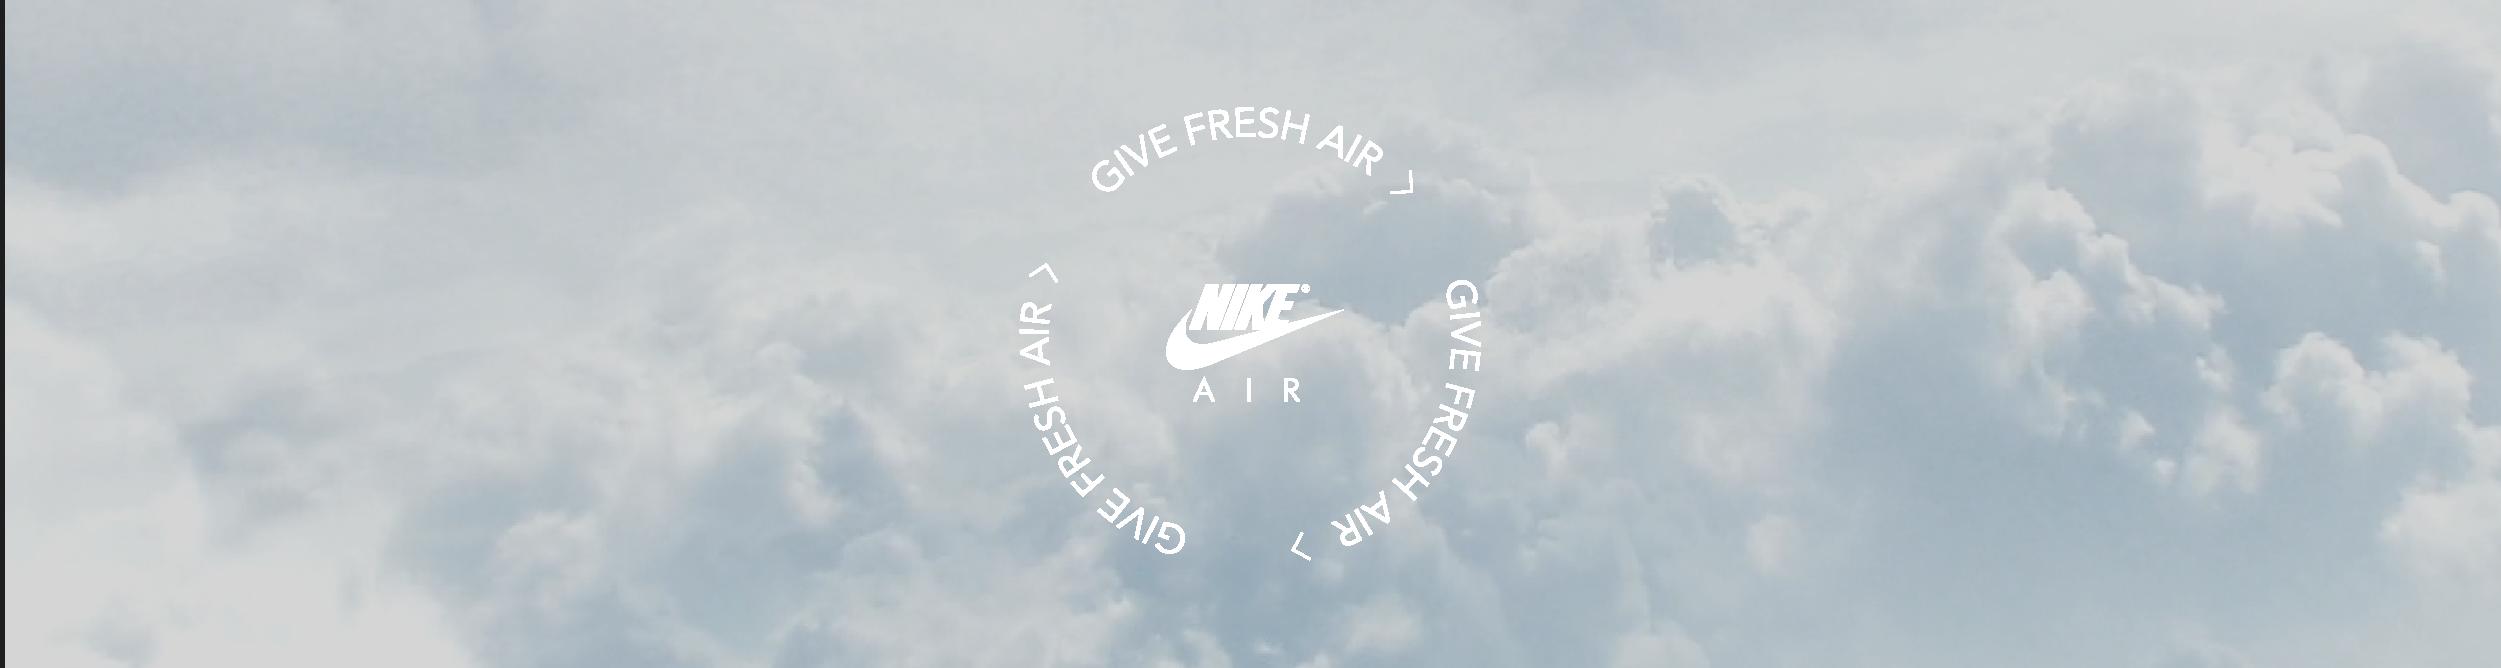 Wish ATL x Nike Give Fresh Air